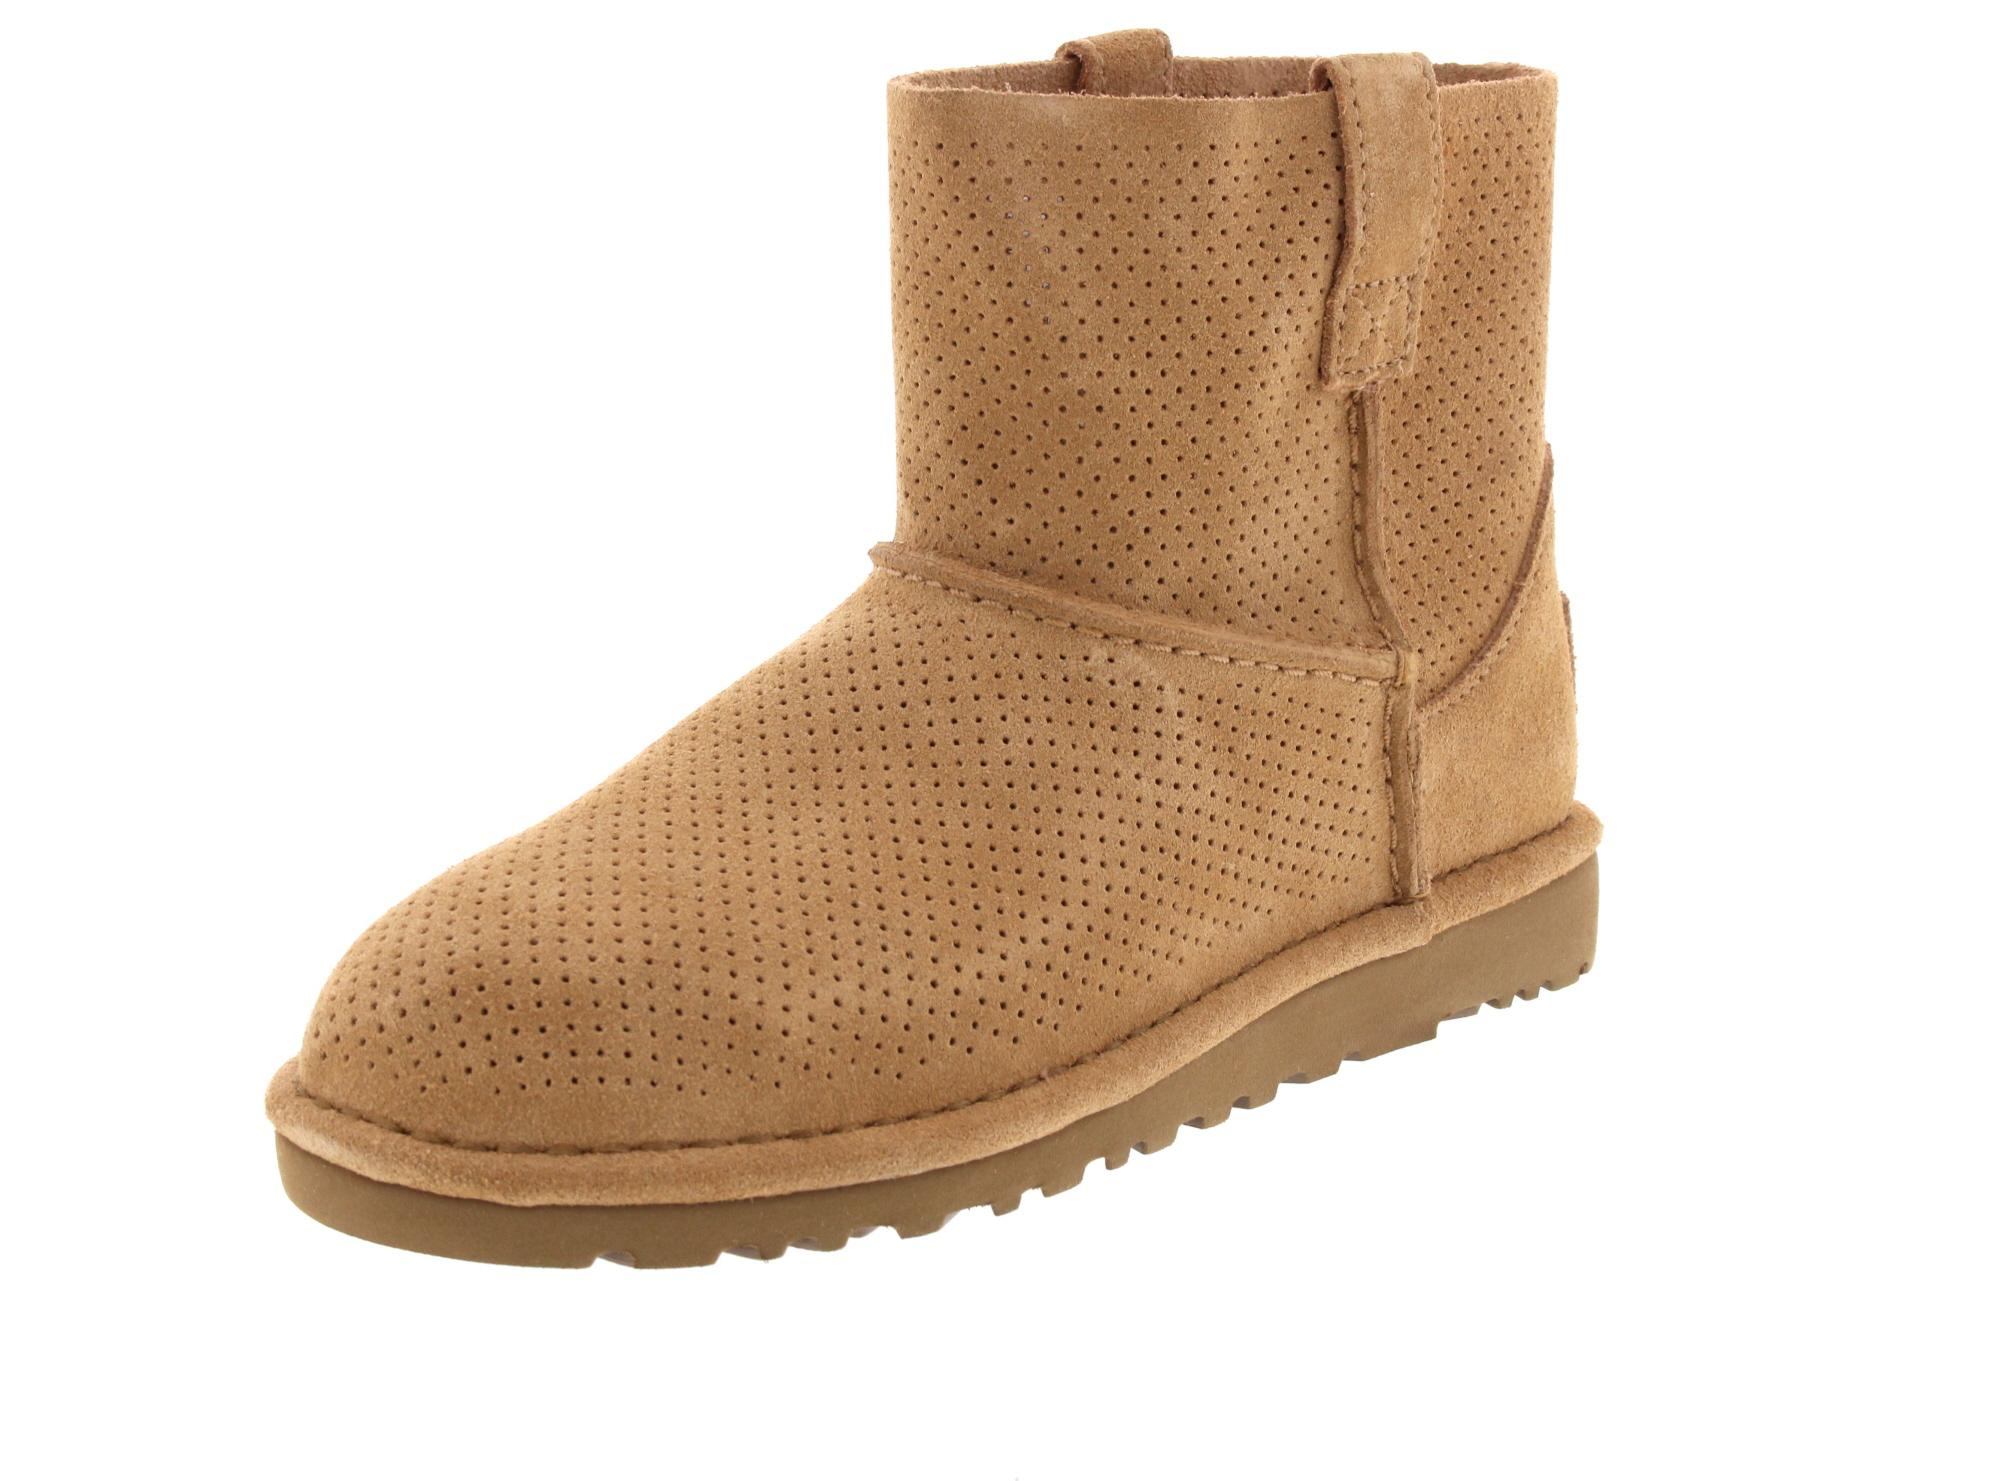 UGG Schuhe - CLASSIC UNLINED MINI PERF 1016852 - tawny-0